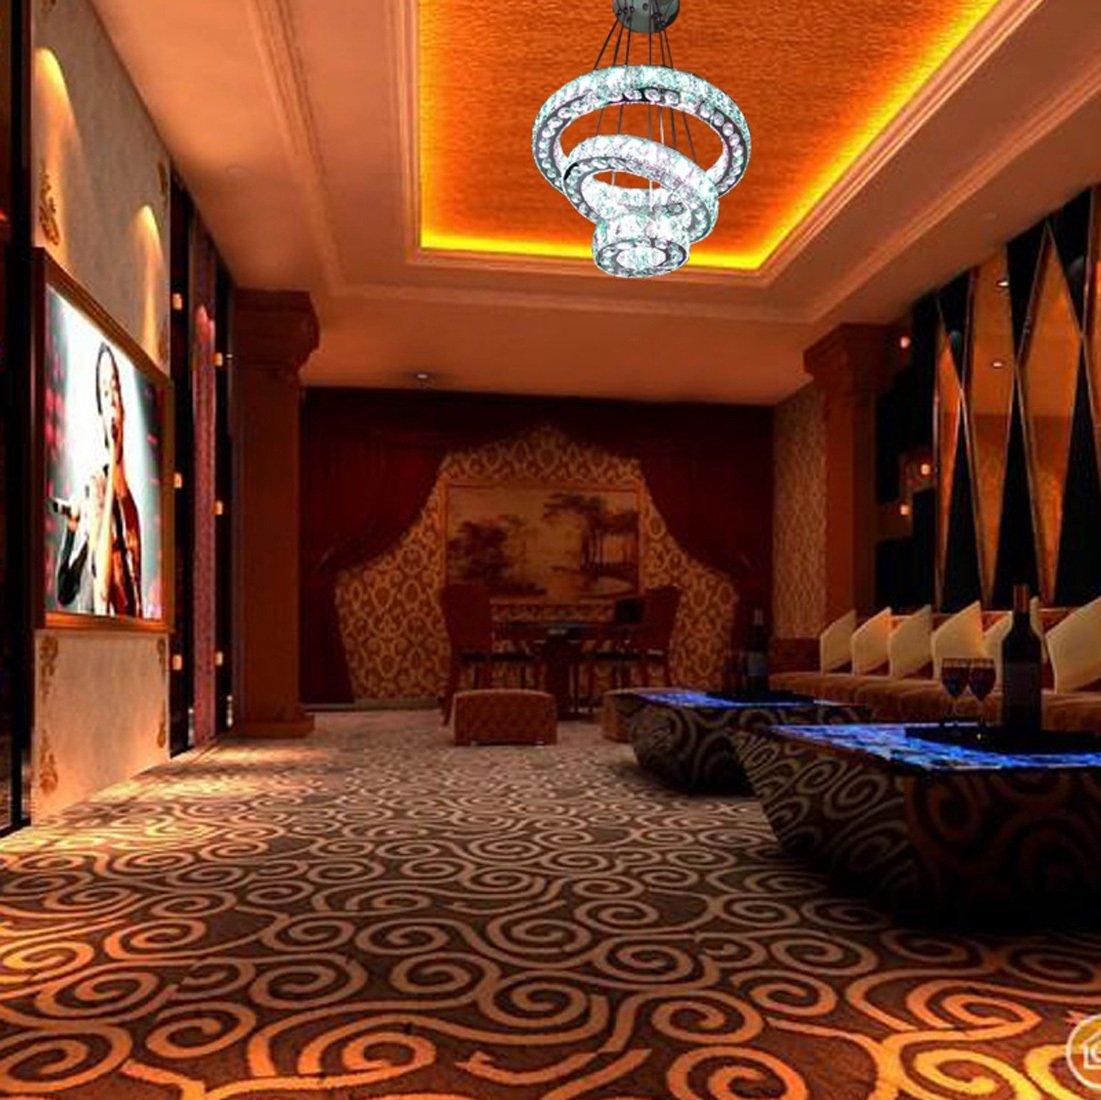 Ydxwan LED RGB DiscolGoldt geformt Kristall Kronleuchter, Kronleuchter, Kronleuchter, Edelstahl, dimmbar, Moderne Moderne Wohnzimmer Kristall Kronleuchter, Kronleuchter B07CSN8RF3 | Große Klassifizierung  e2f850